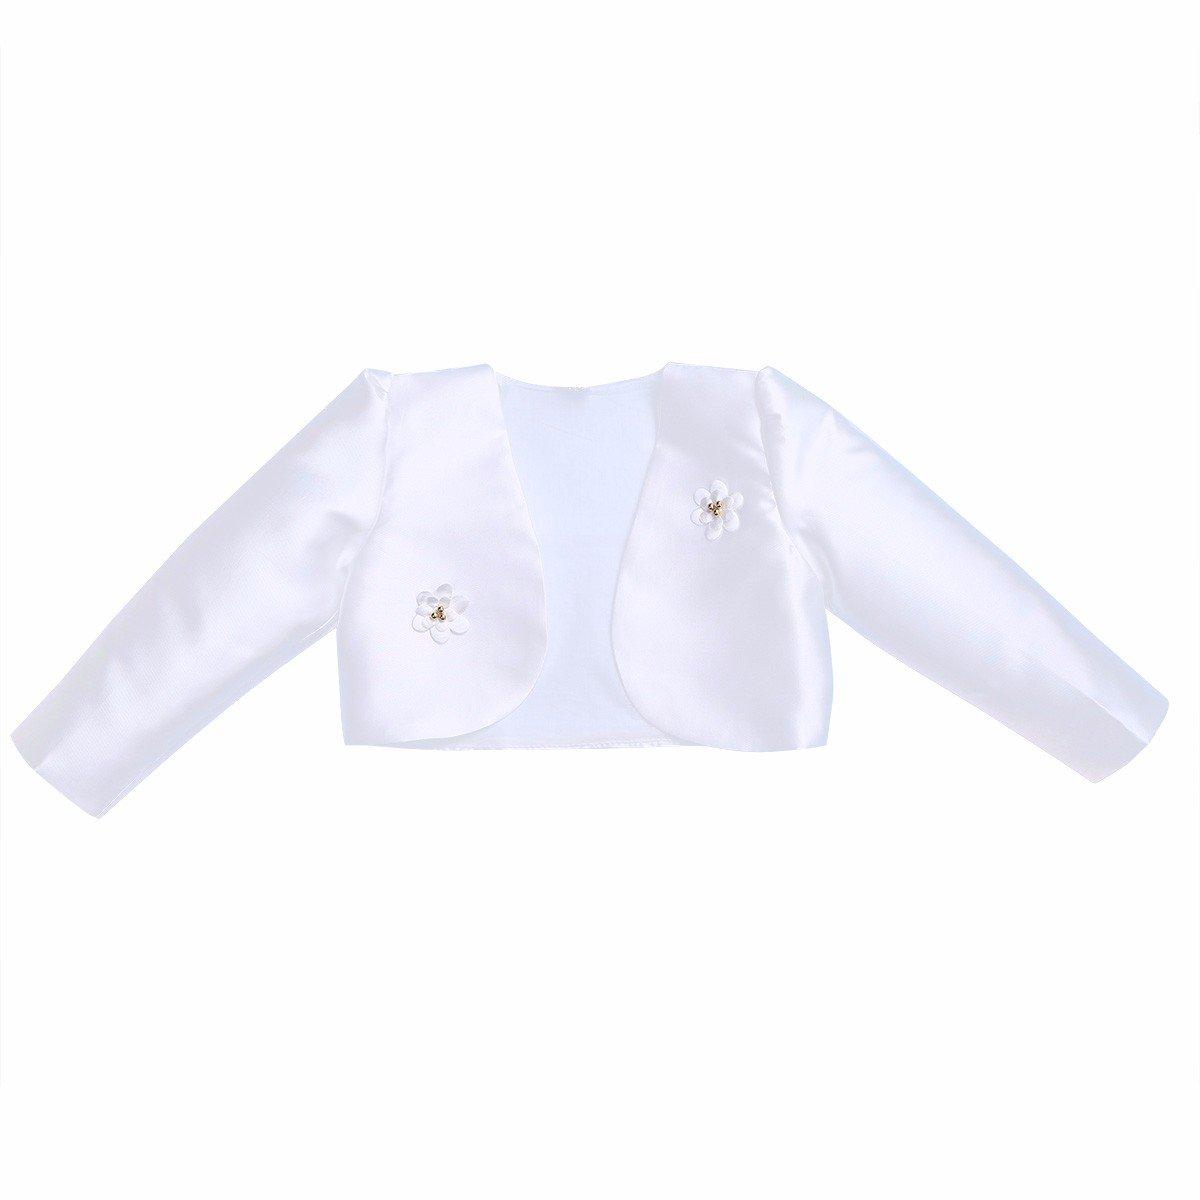 FEESHOW Girls Long Sleeve Satin Shrug Bolero Jacket Short Cardigan Dress Cover up